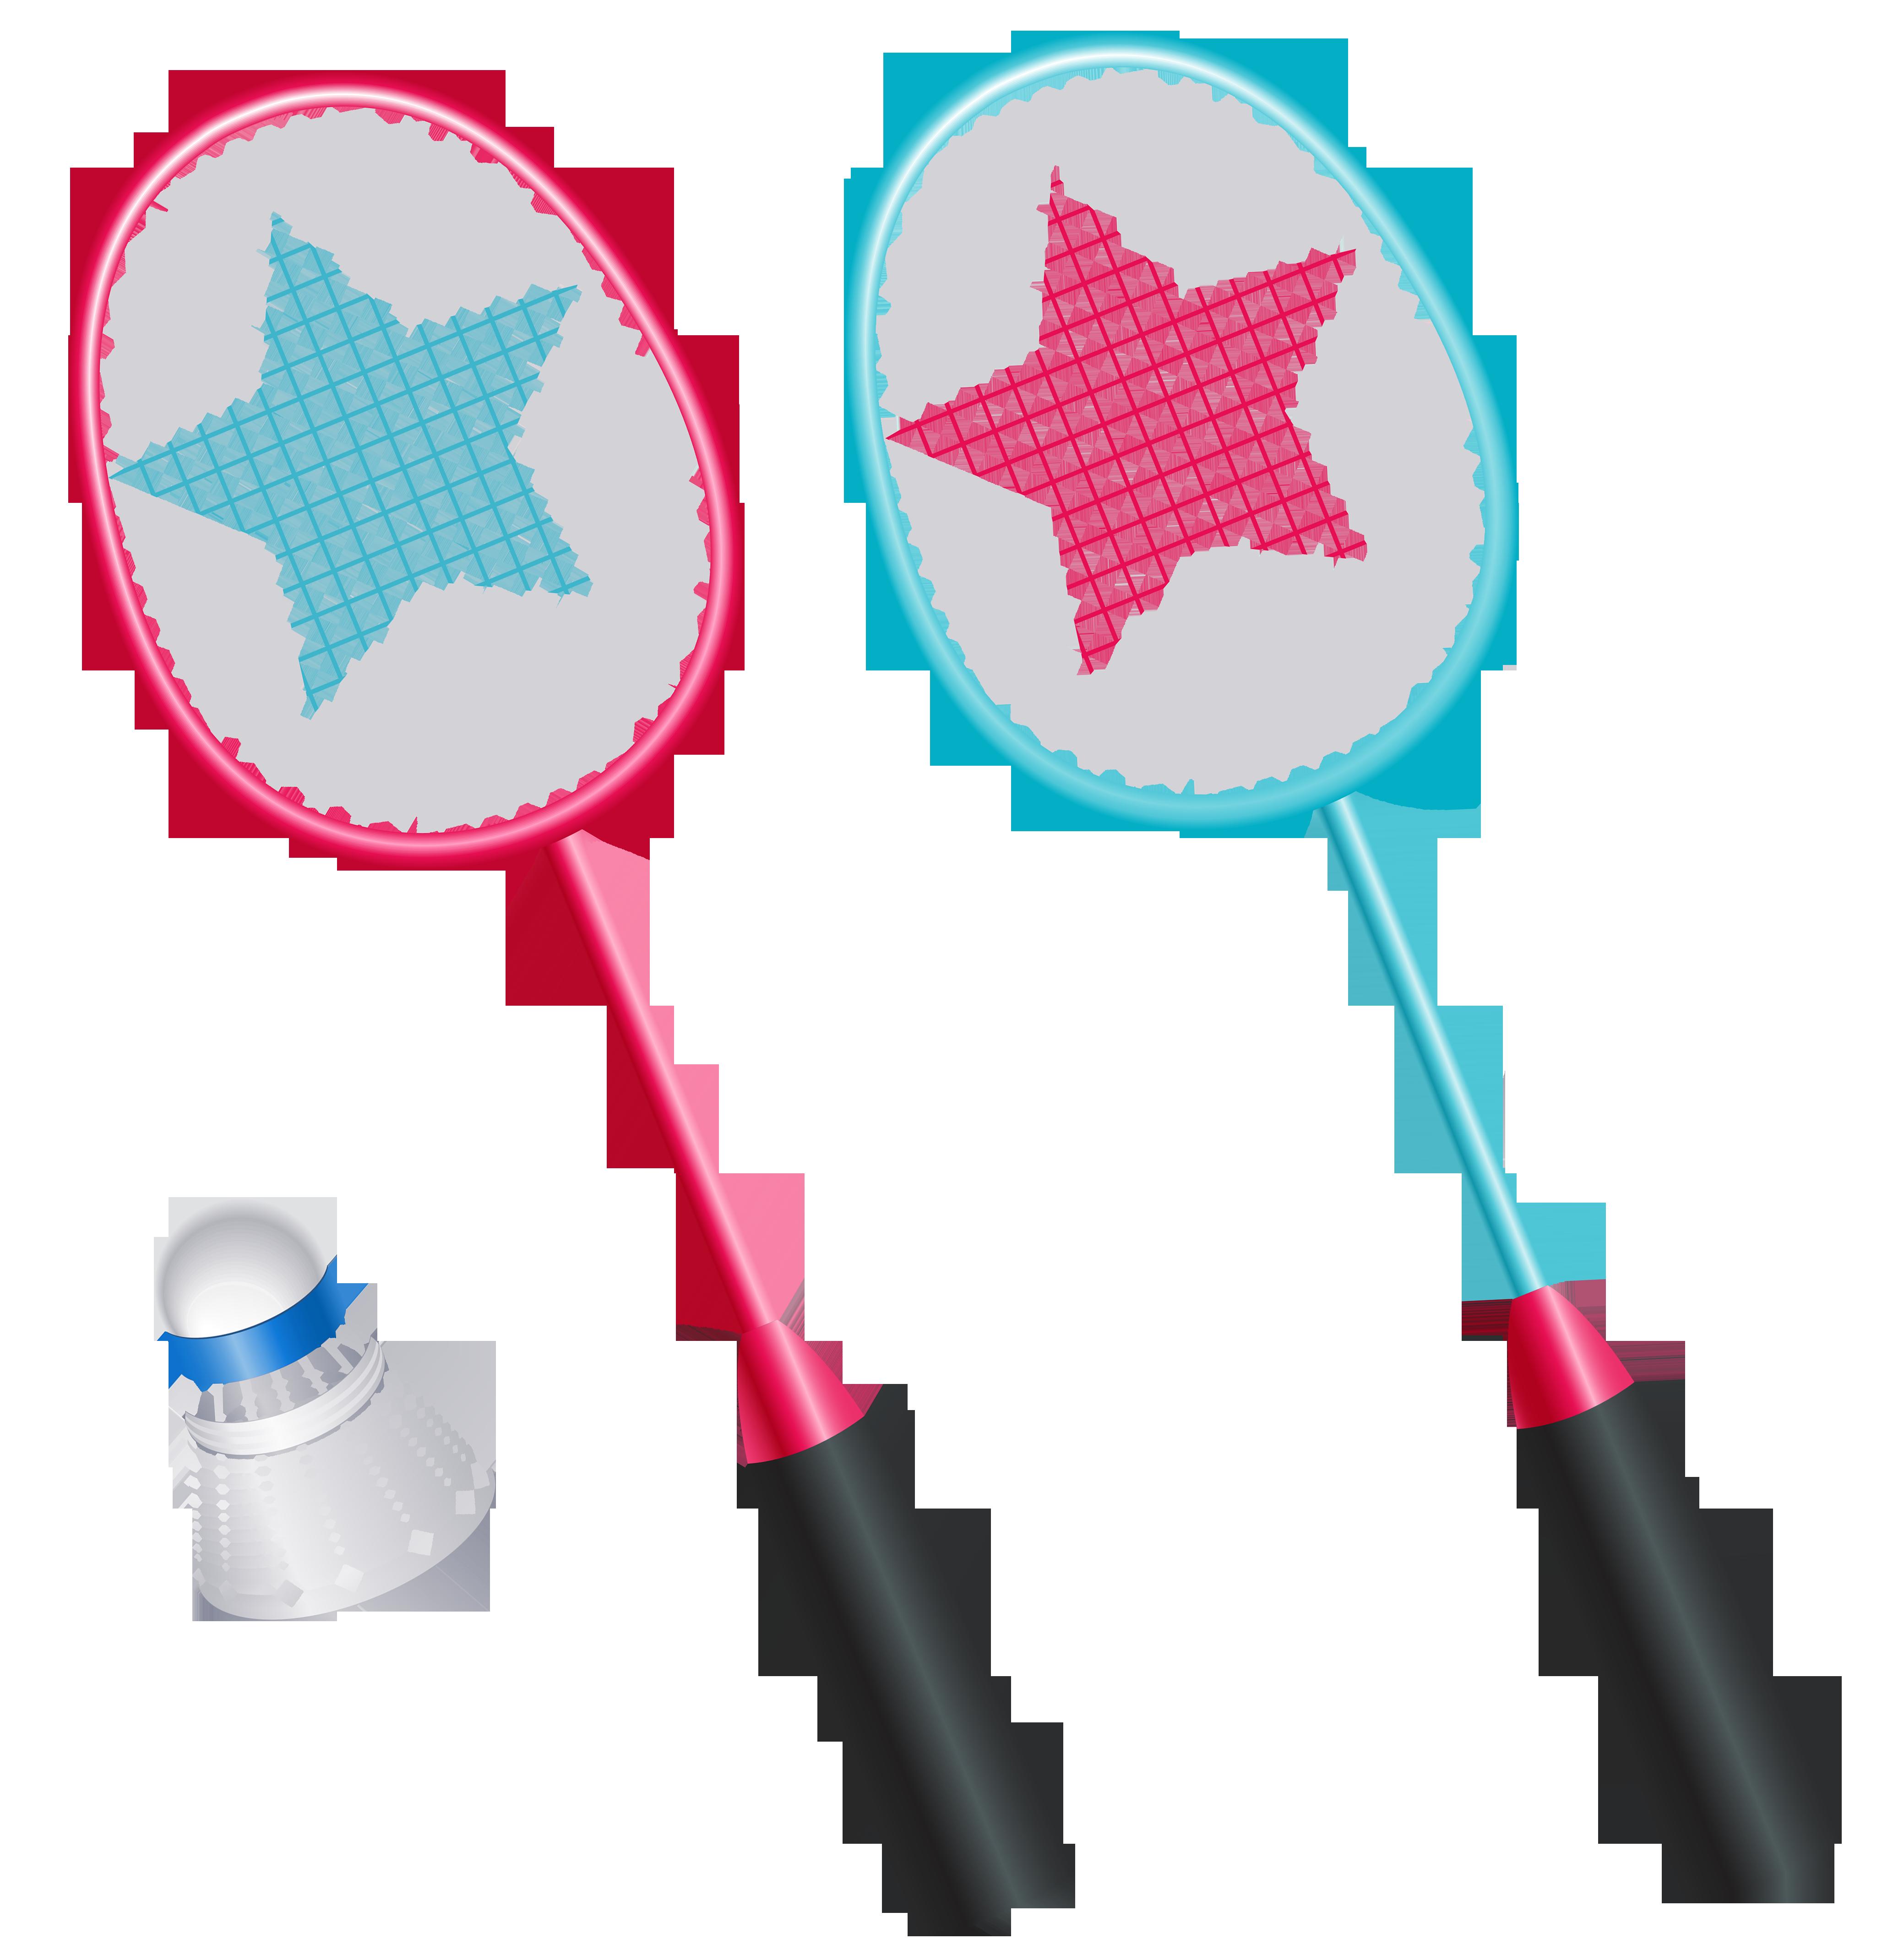 Baseball bat and tennis racket clipart clip library Badminton Racket Shuttlecock Icon - Badminton Rackets with ... clip library